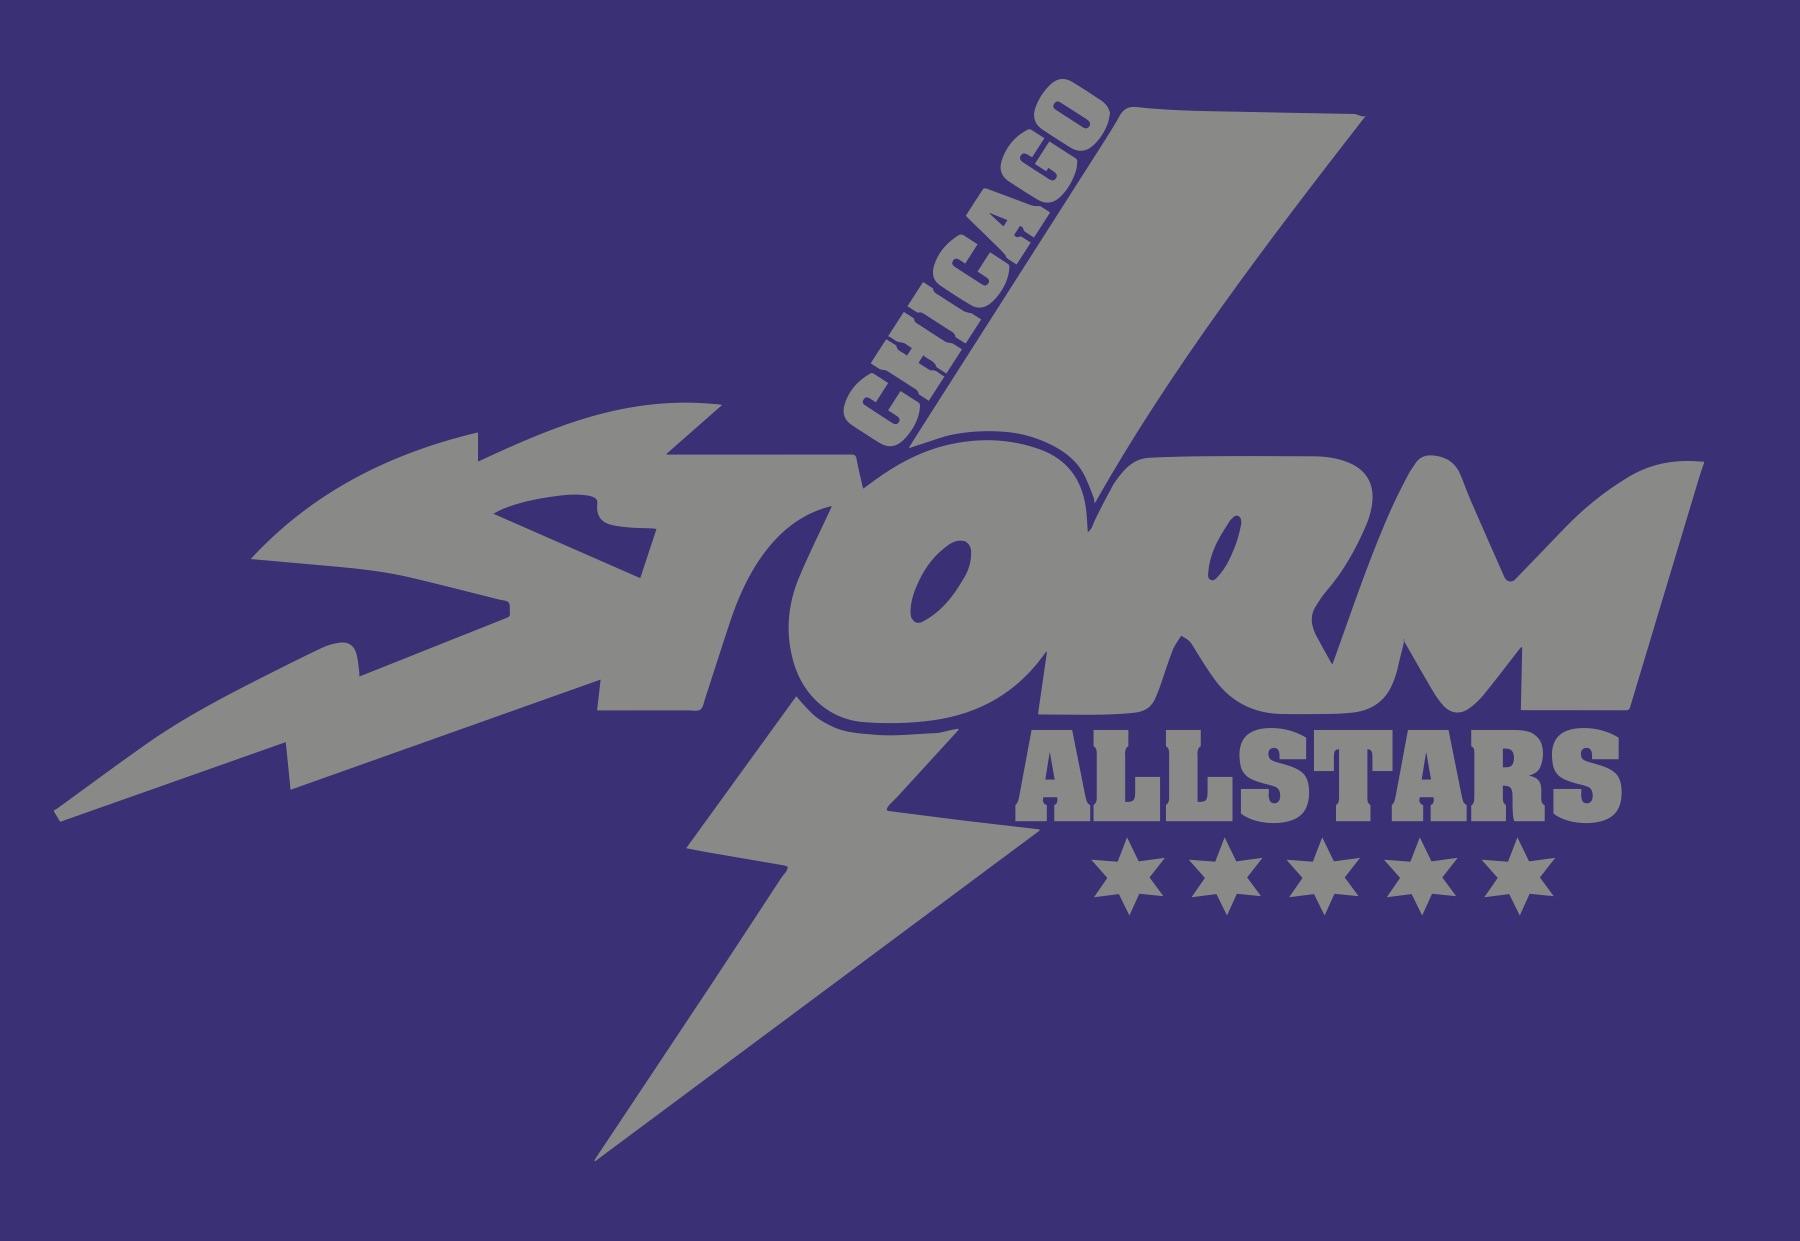 Chicago Storm All-Star Elite